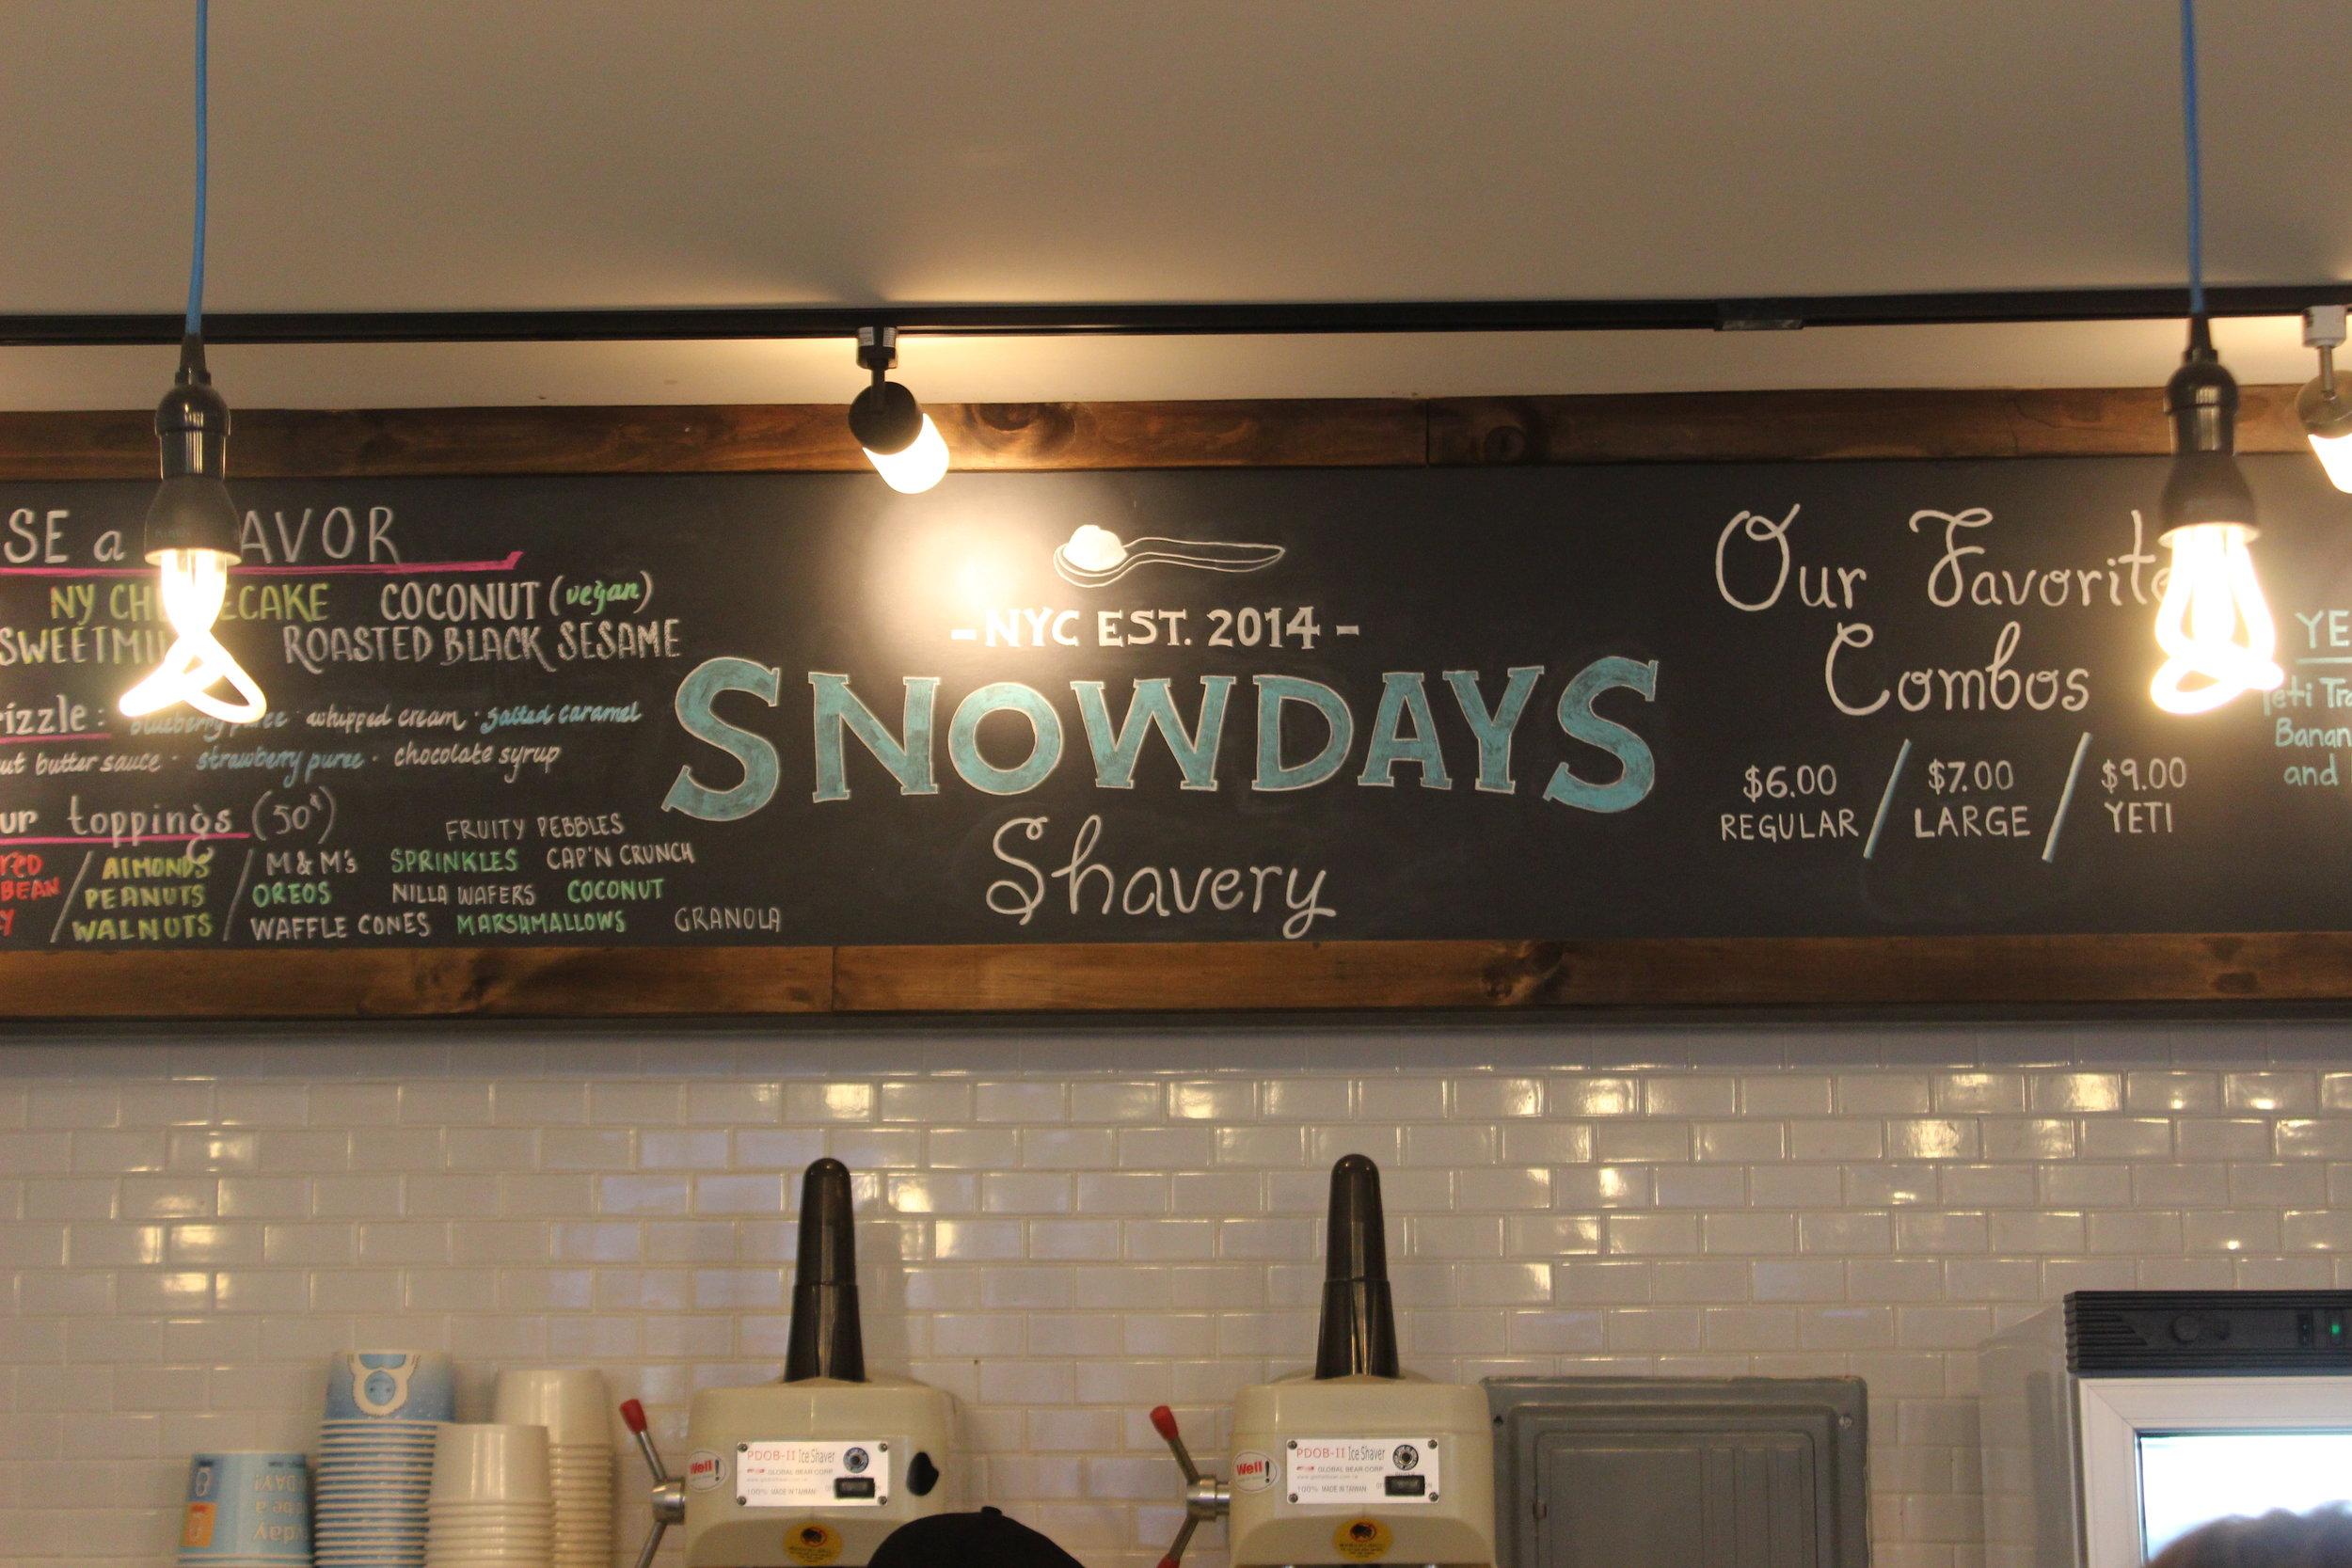 Yeti Food at Snowdays Shavery